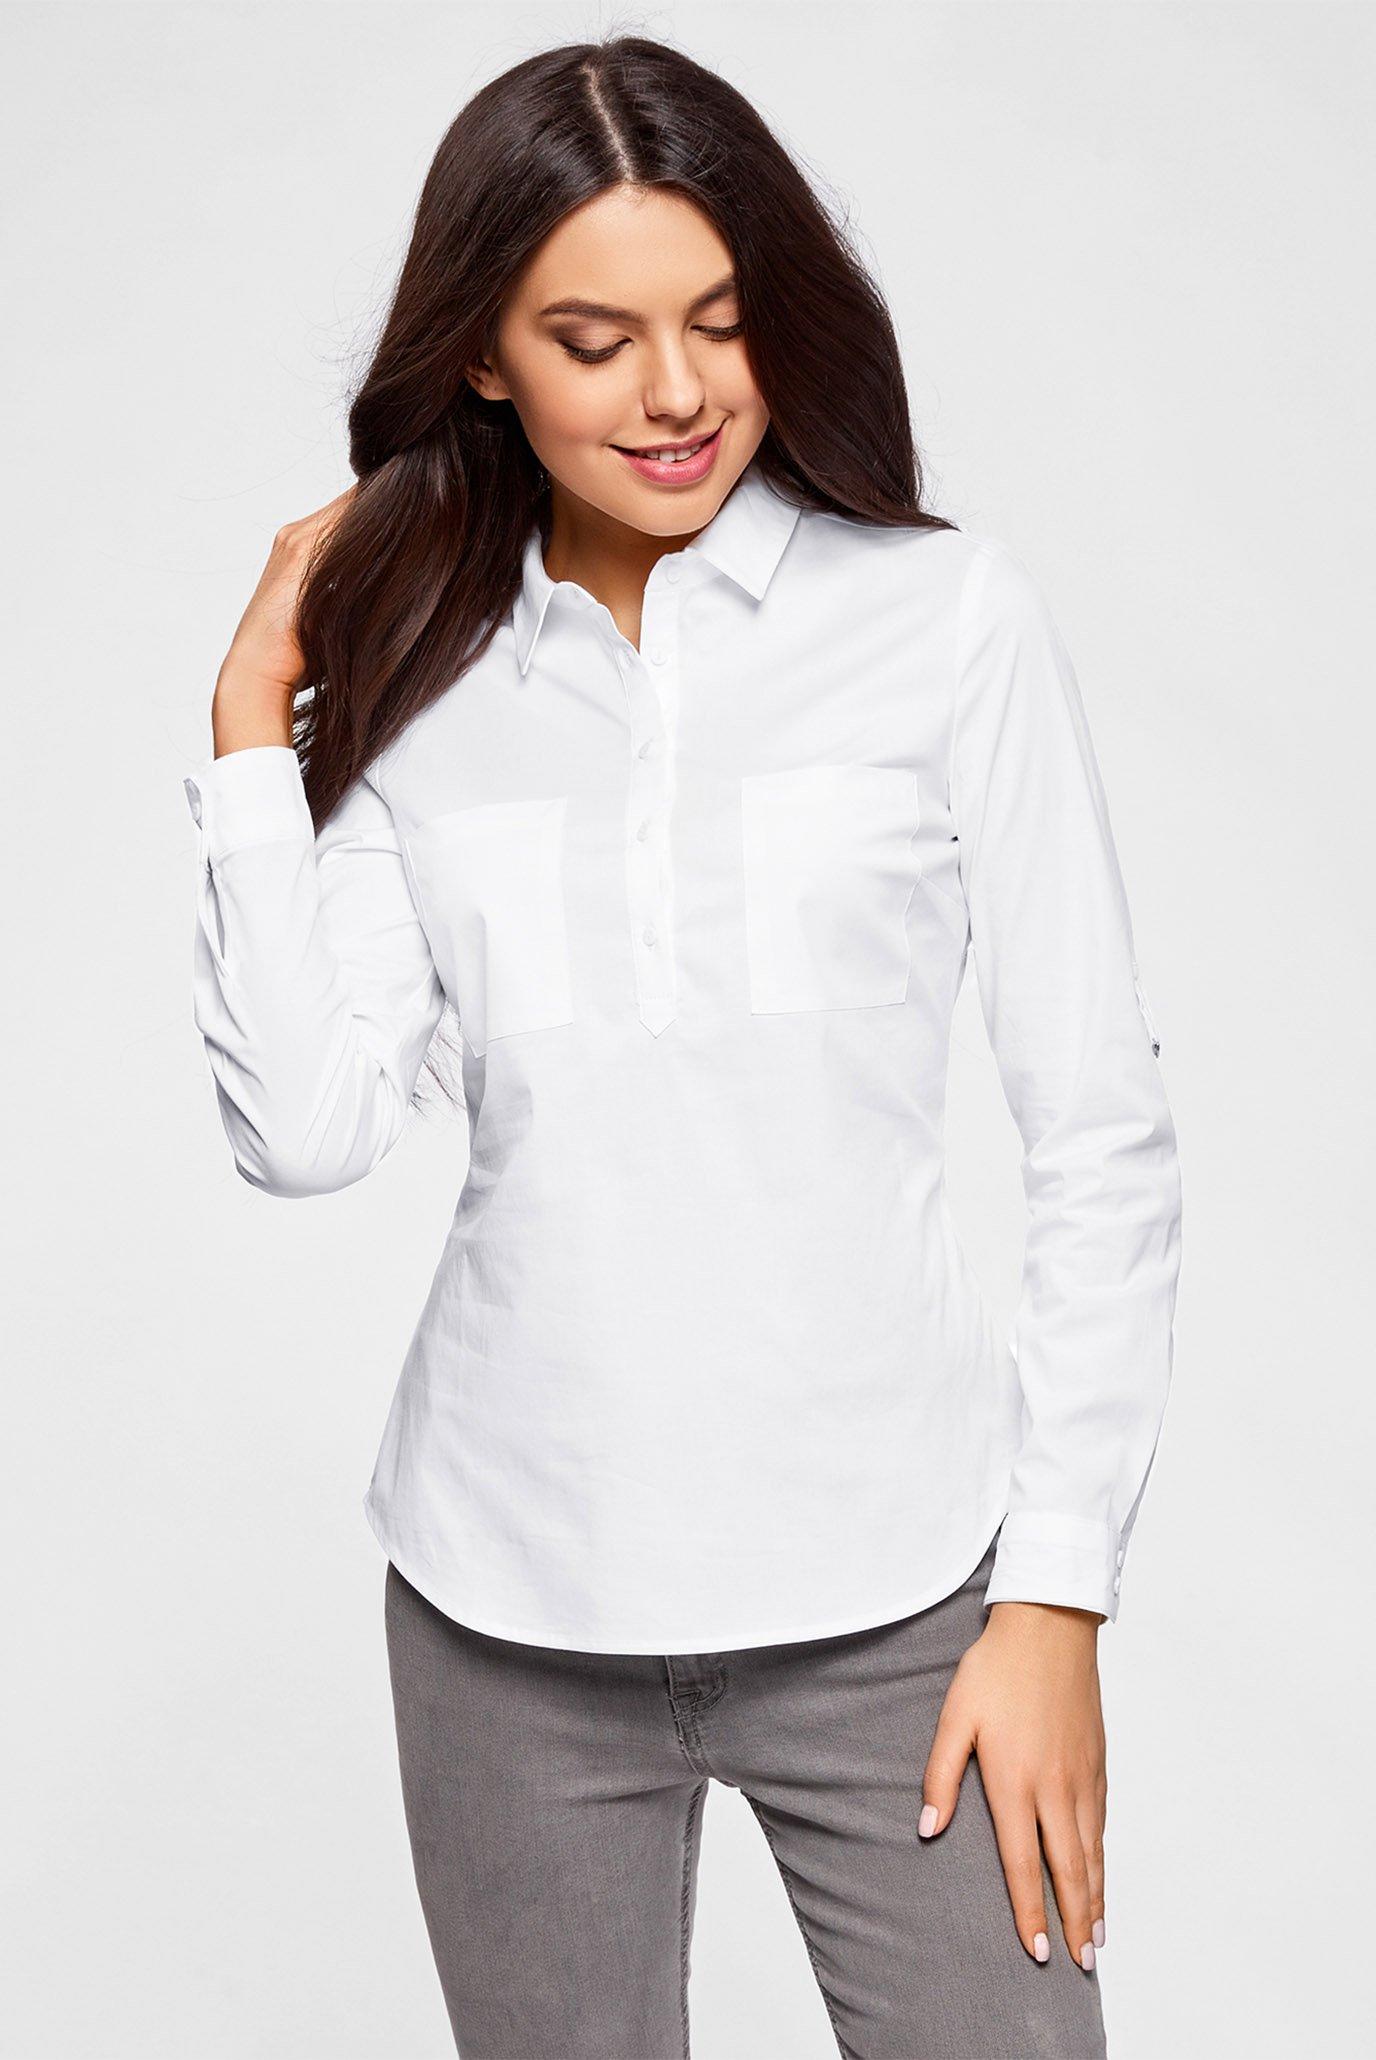 b648615f6ec Купить Женская белая рубашка Oodji Oodji 11403222B 42468 1000N – Киев